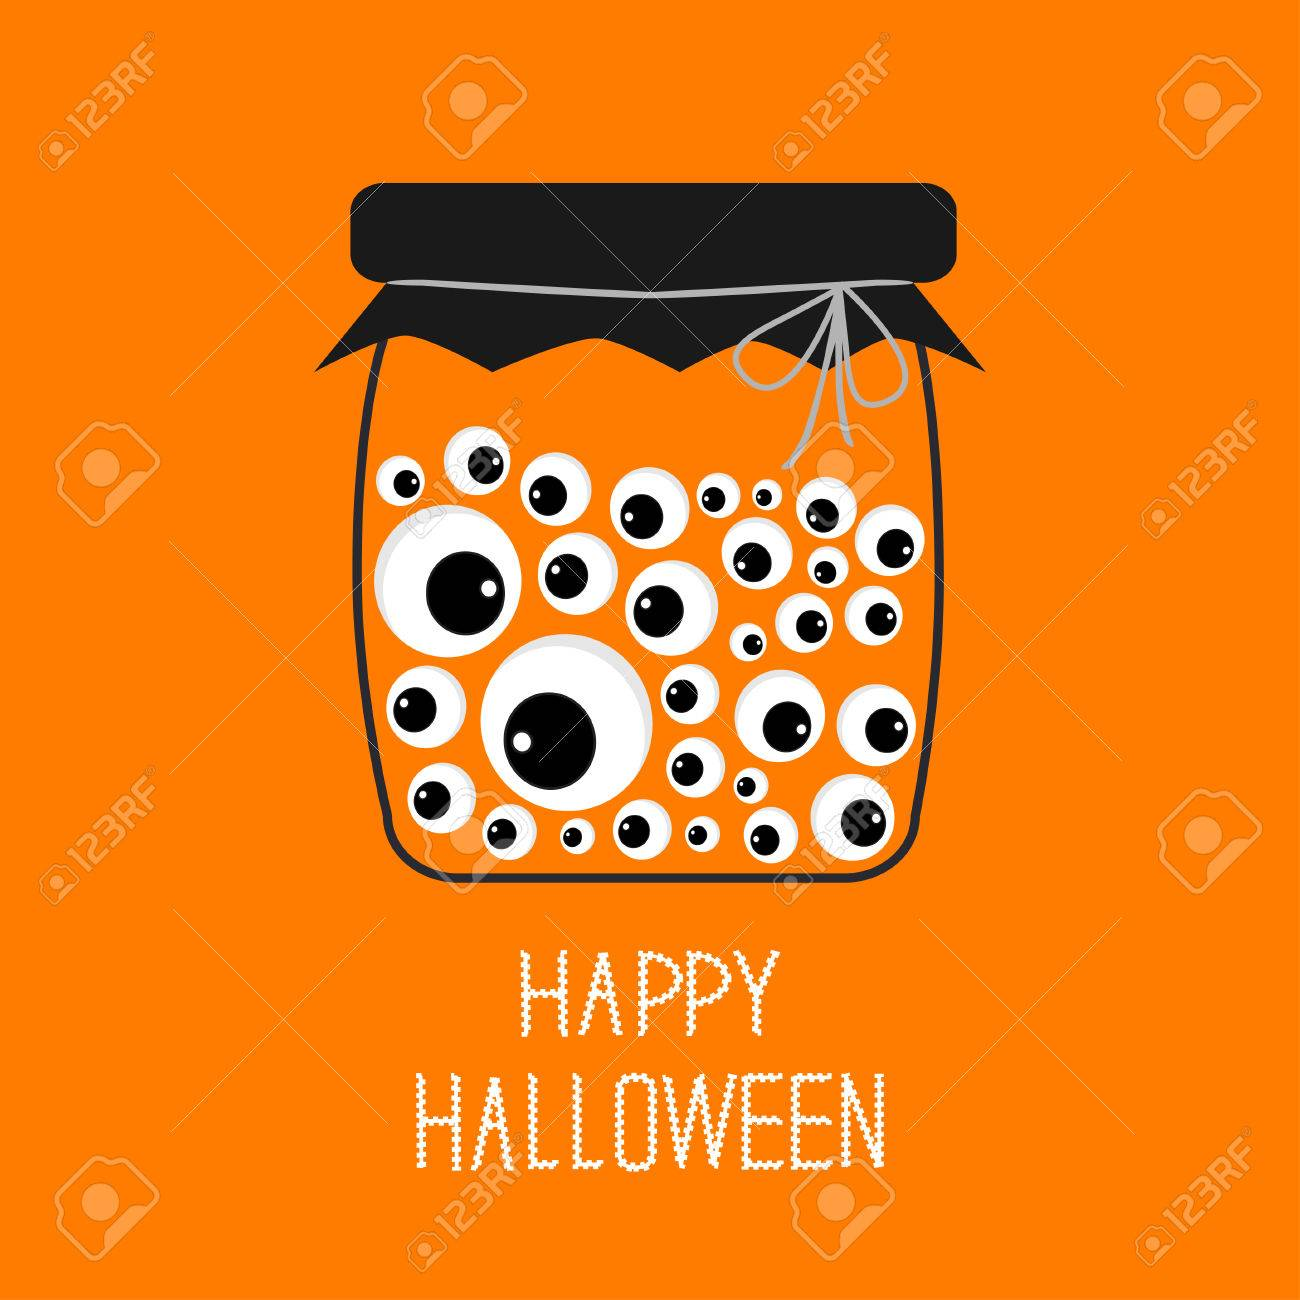 Glass Bottle Jar With Eyeballs Halloween Card. Spooky Orange Background  Flat Design. Vector Illustration